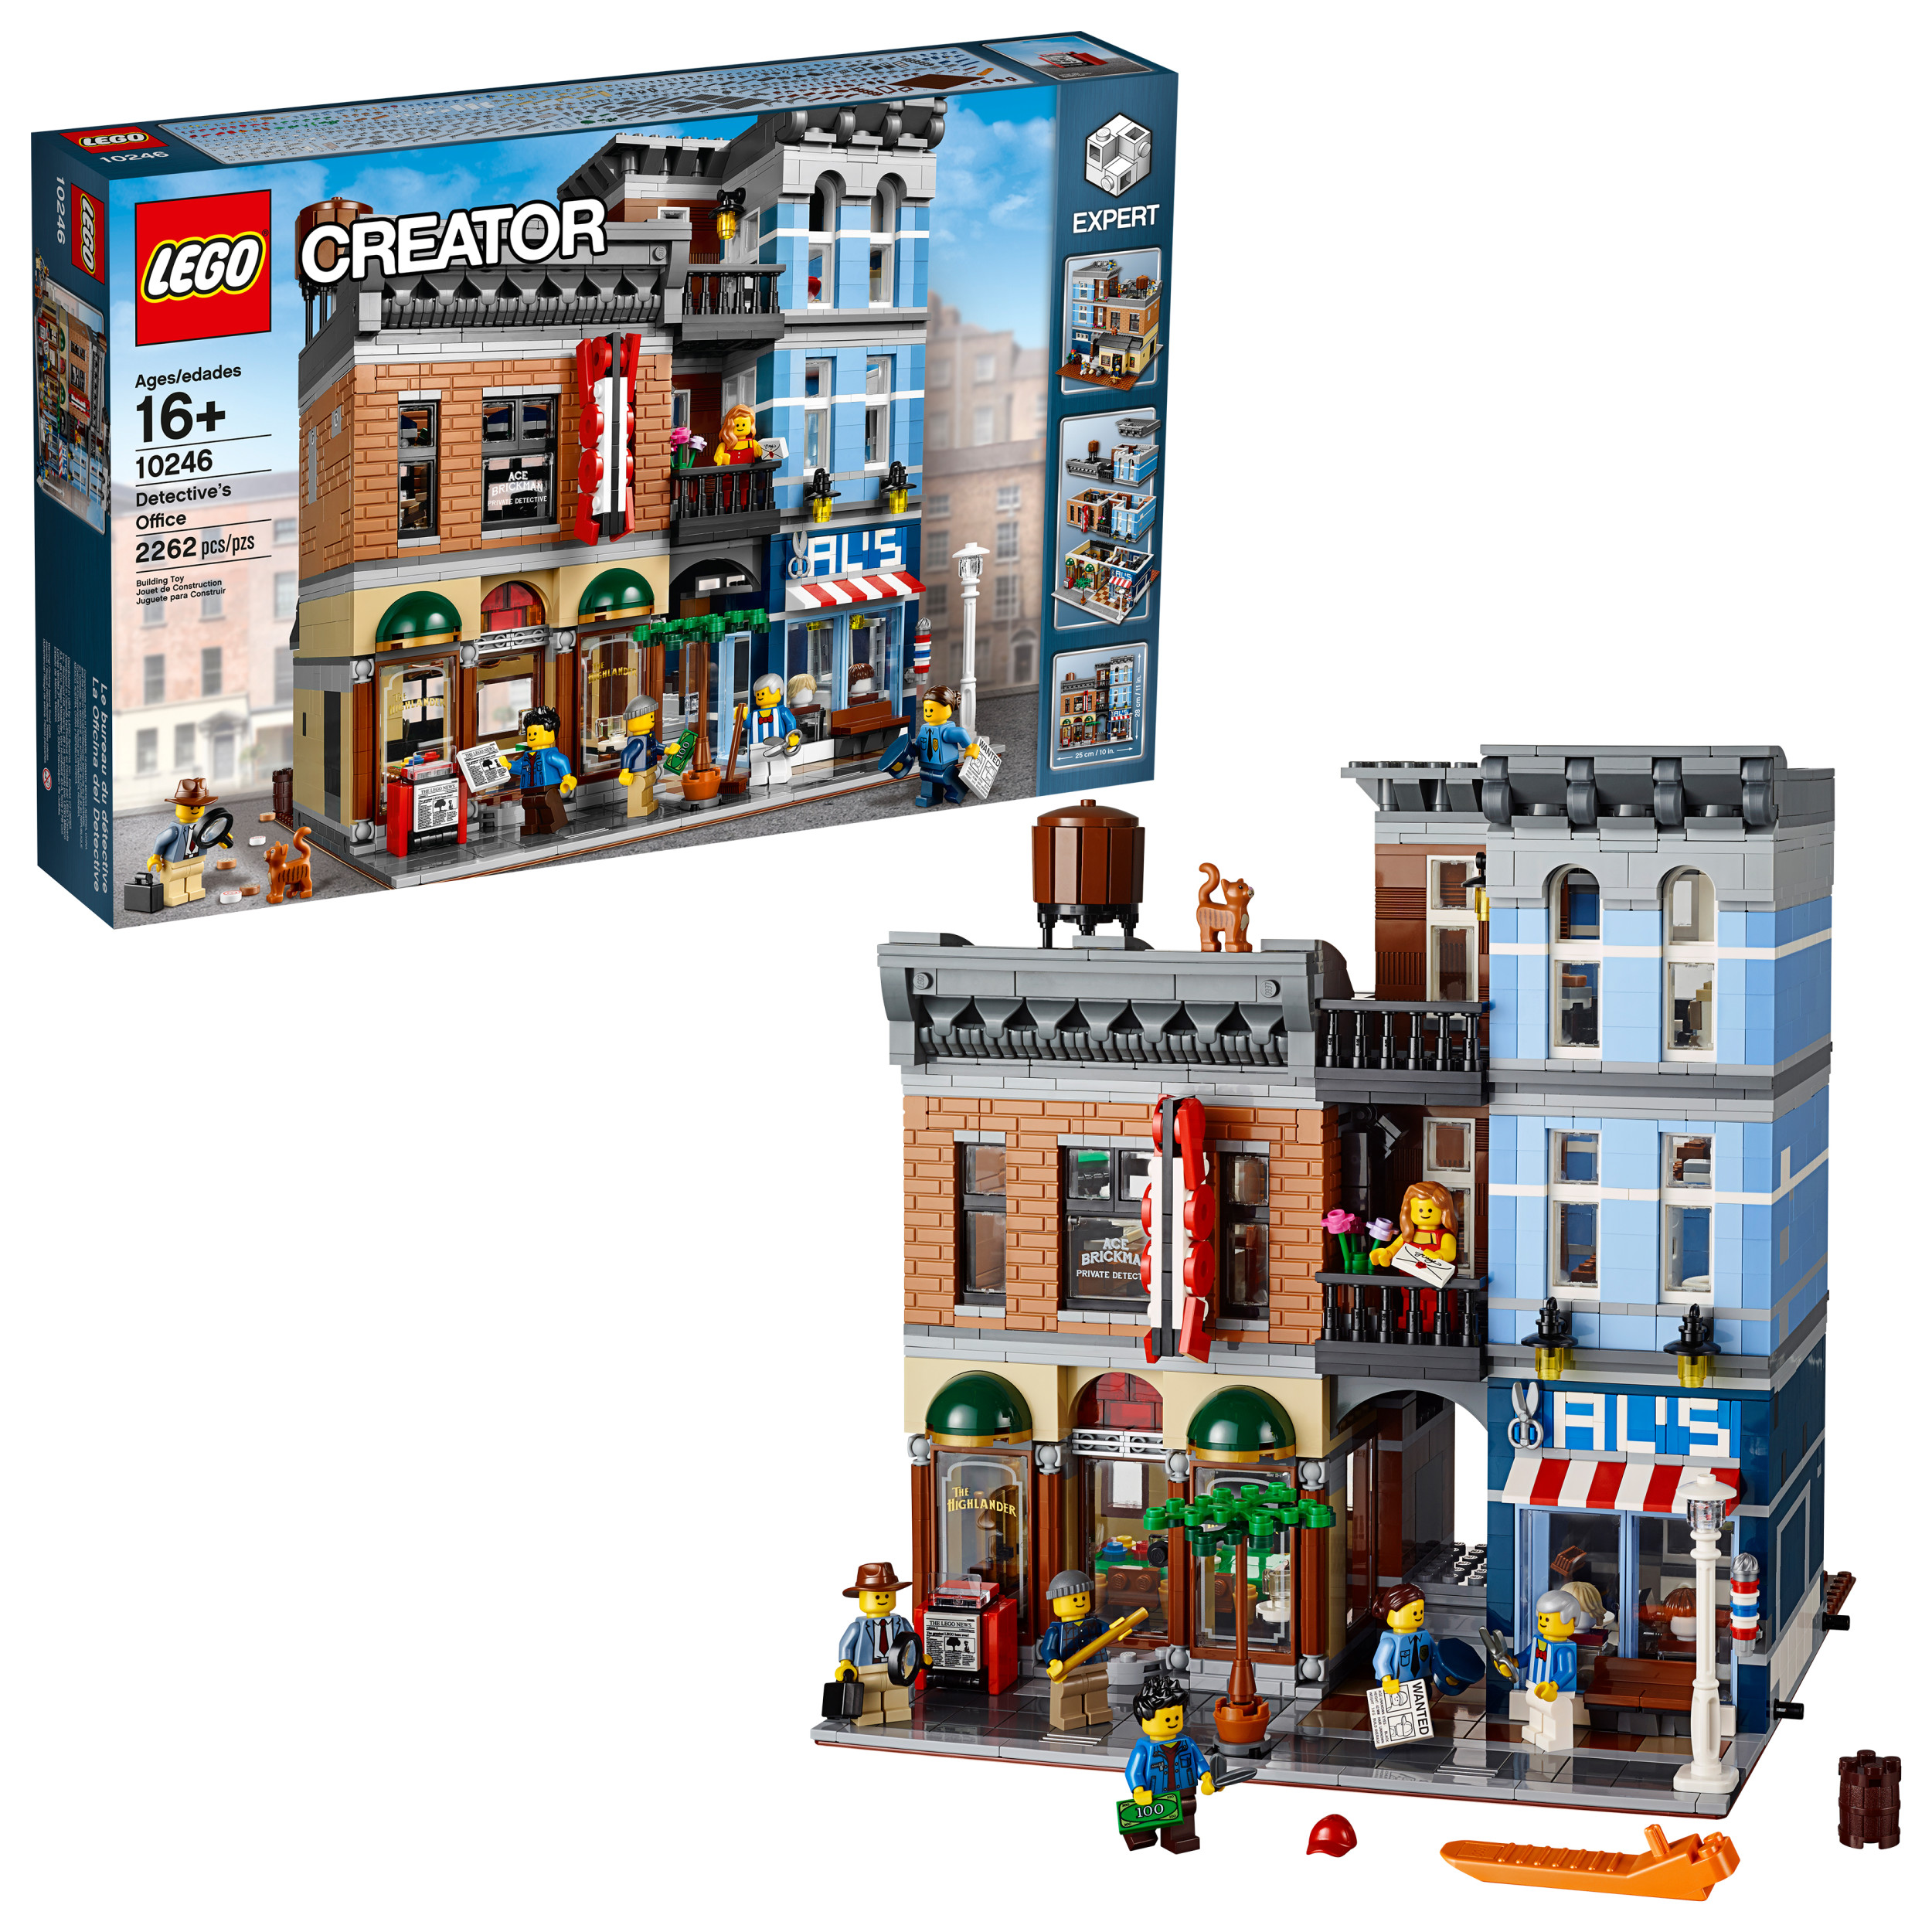 LEGO Creator Expert Detective's Office 10246 - Walmart.com